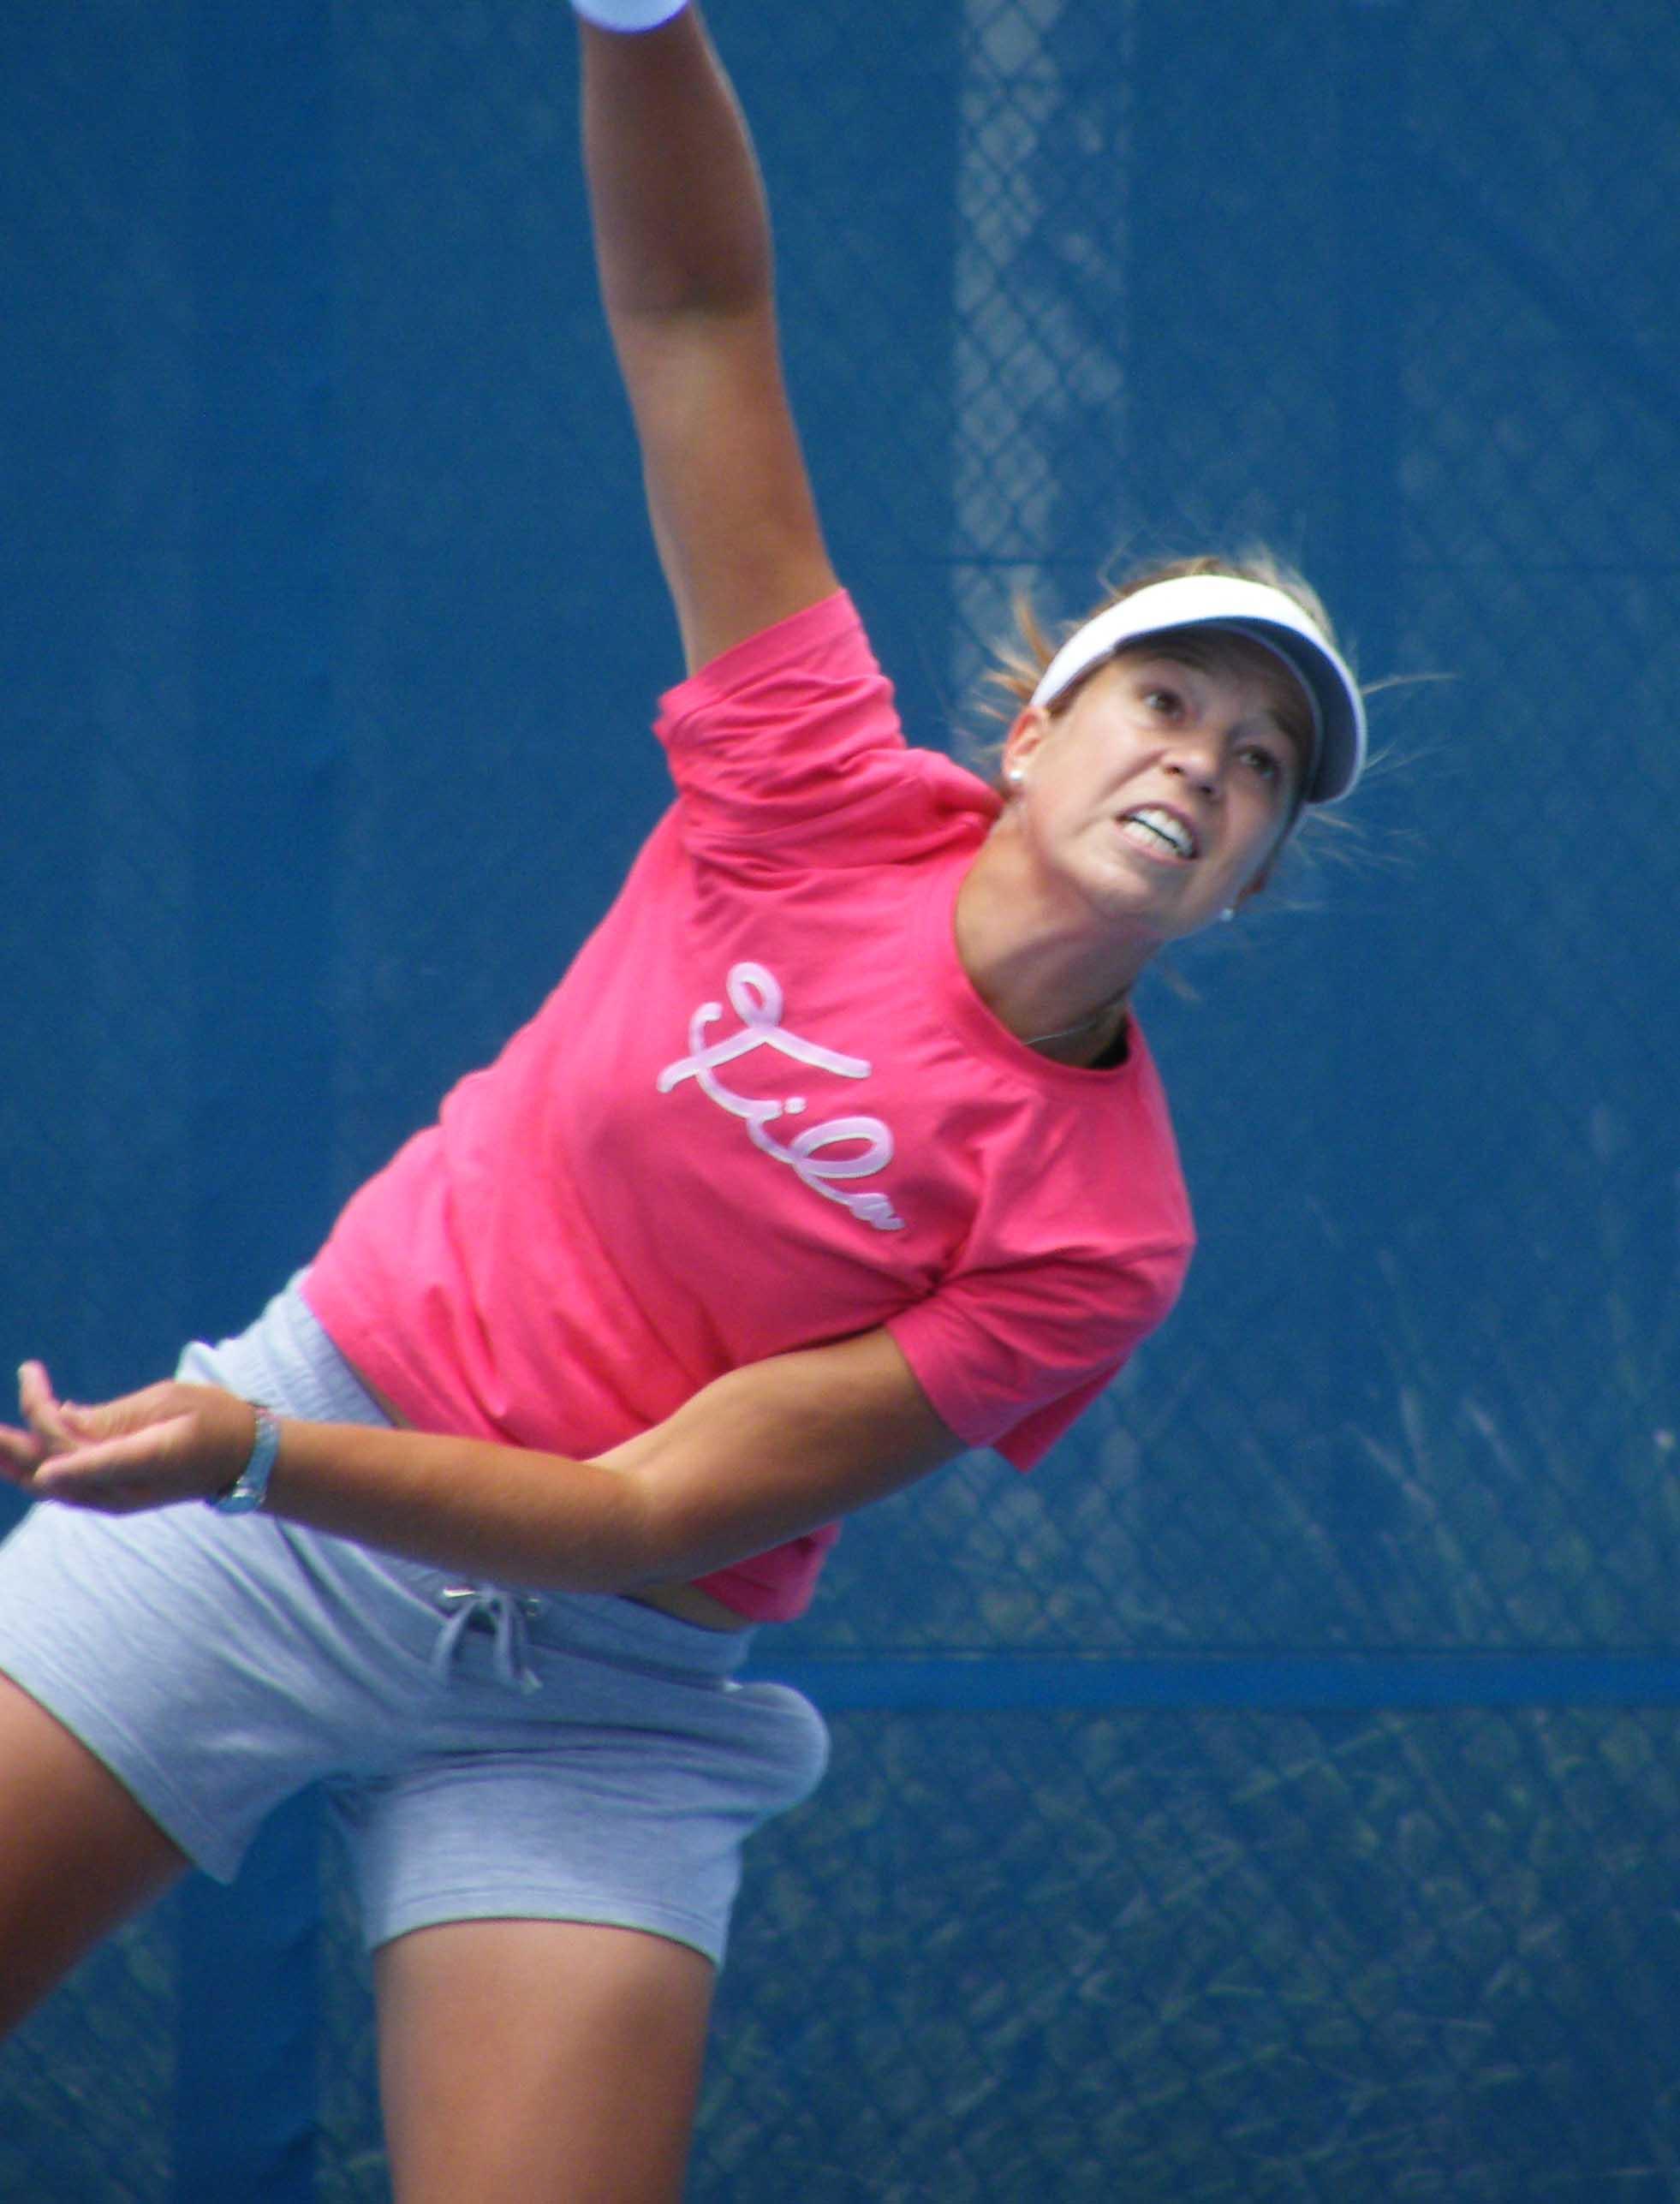 Hot tennis players female pics